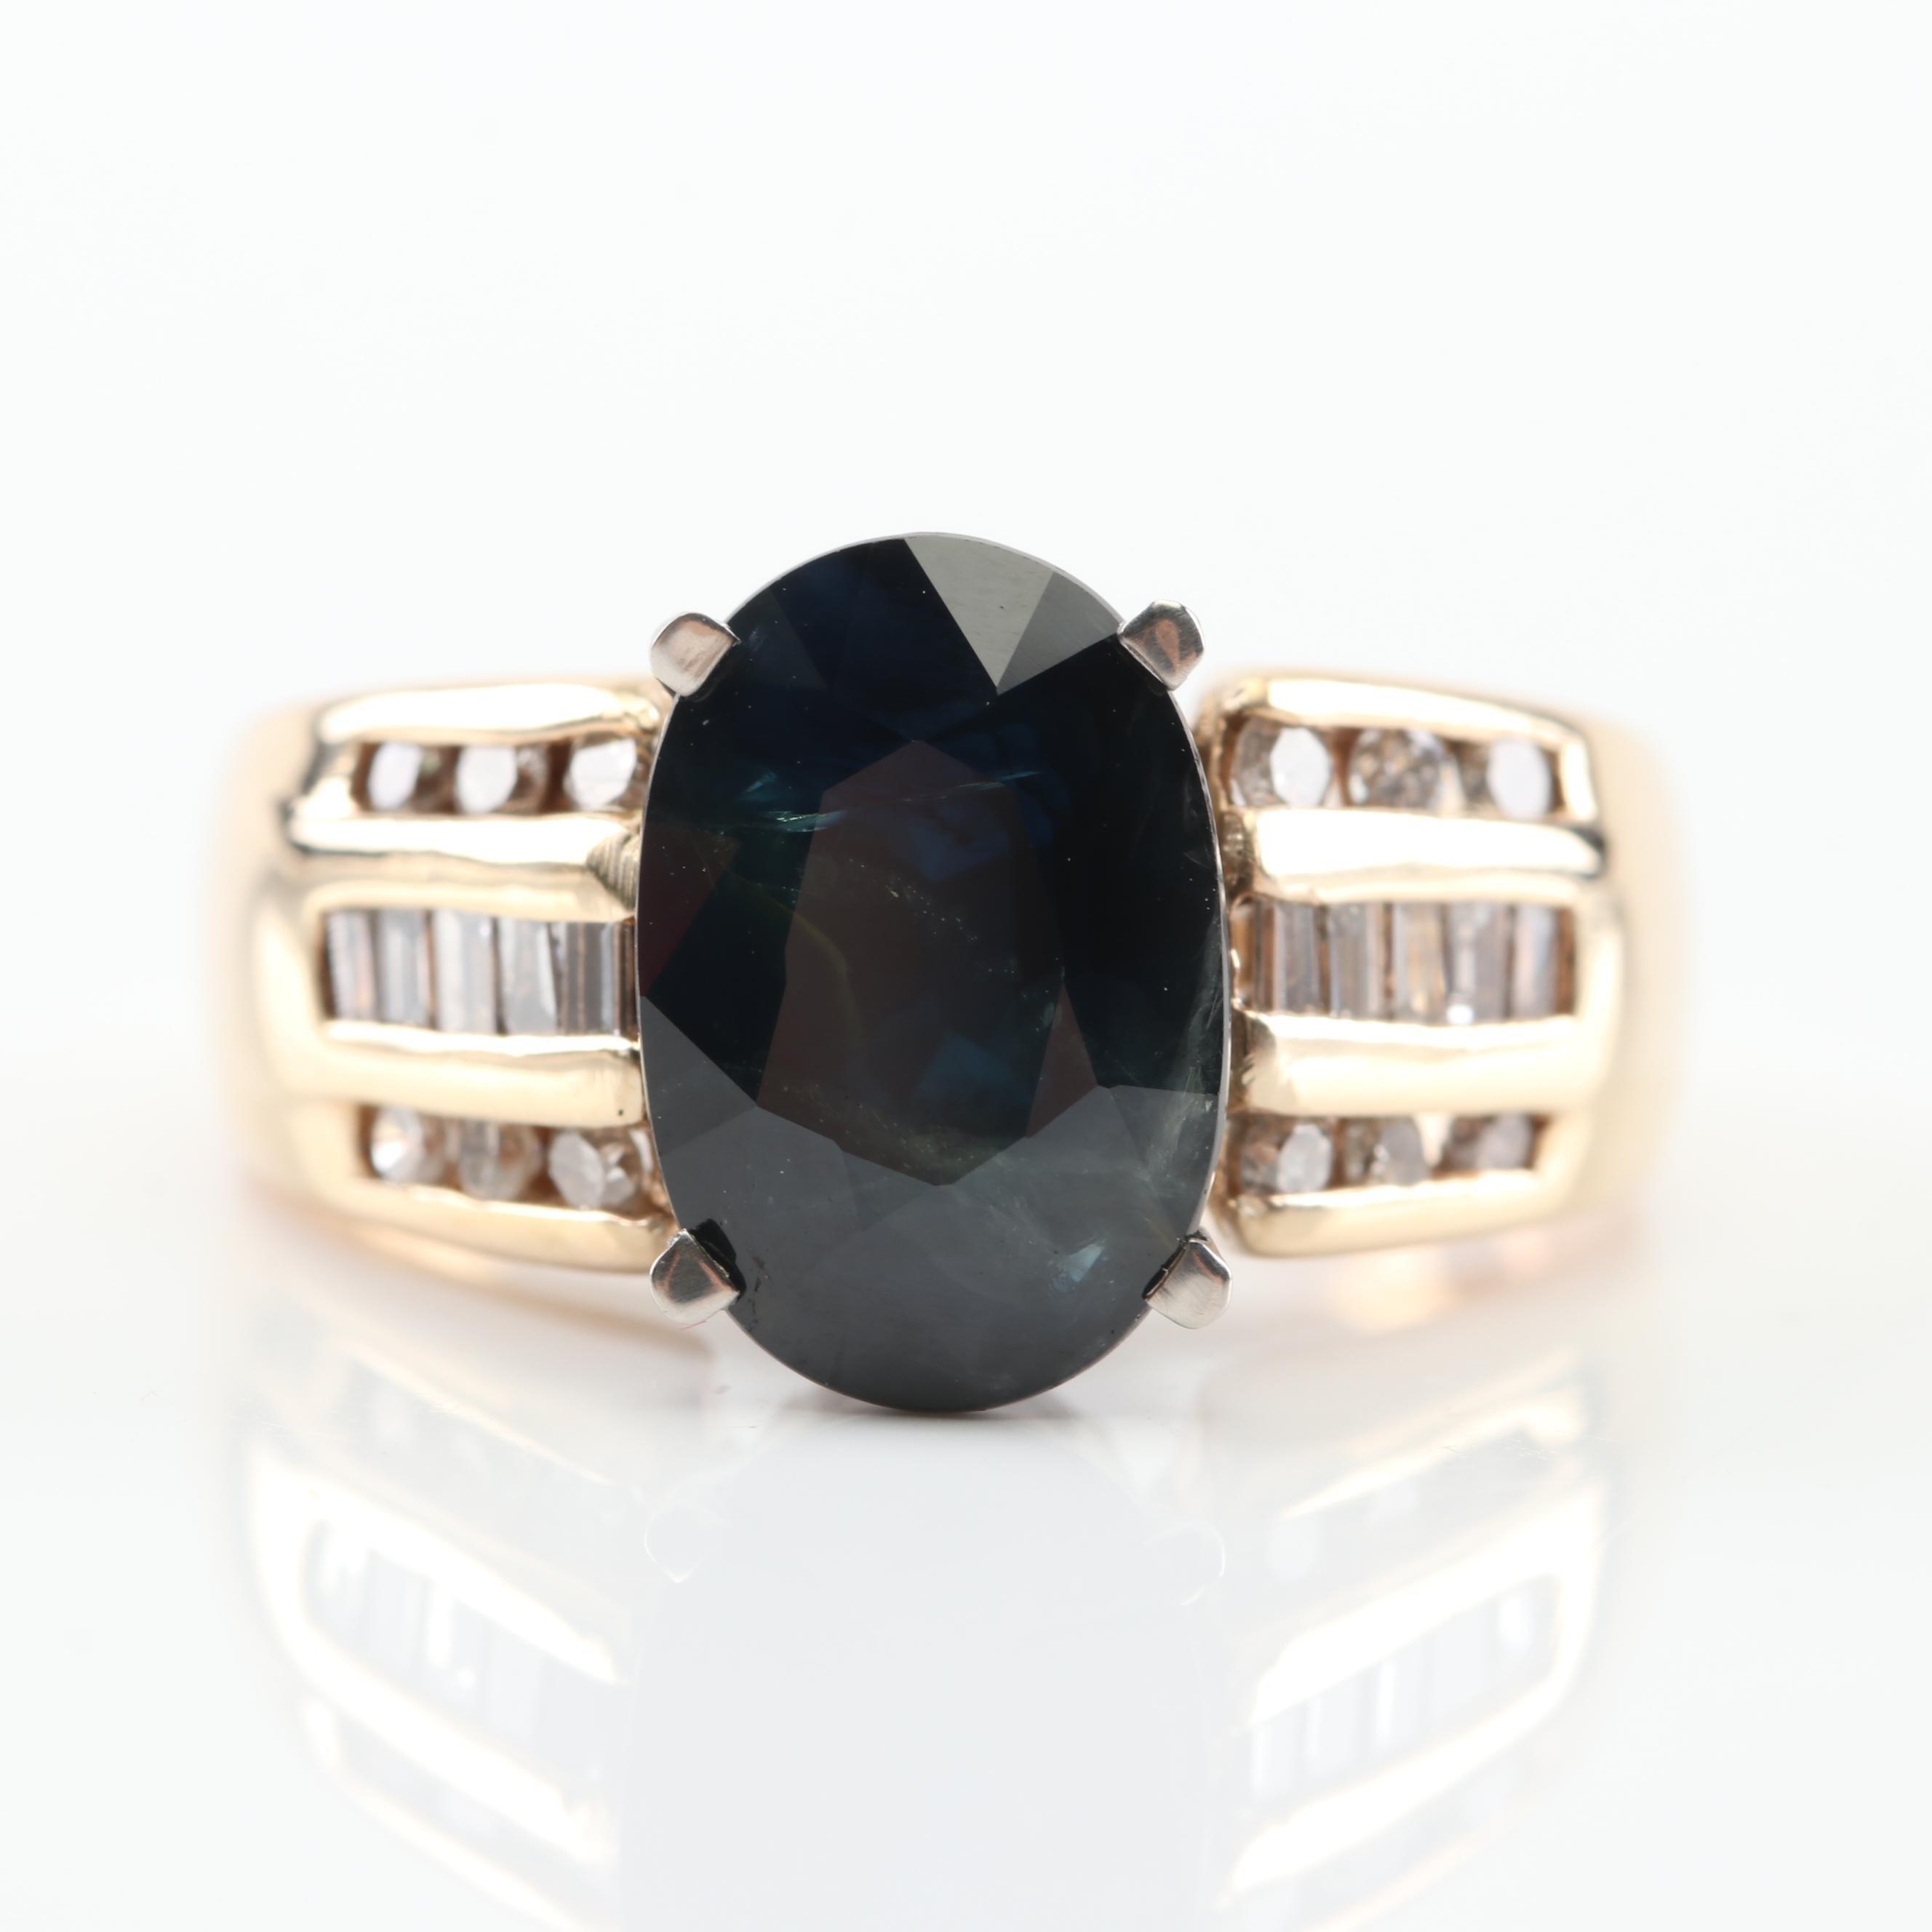 14K Yellow Gold 3.75 CT Sapphire and Diamond Ring